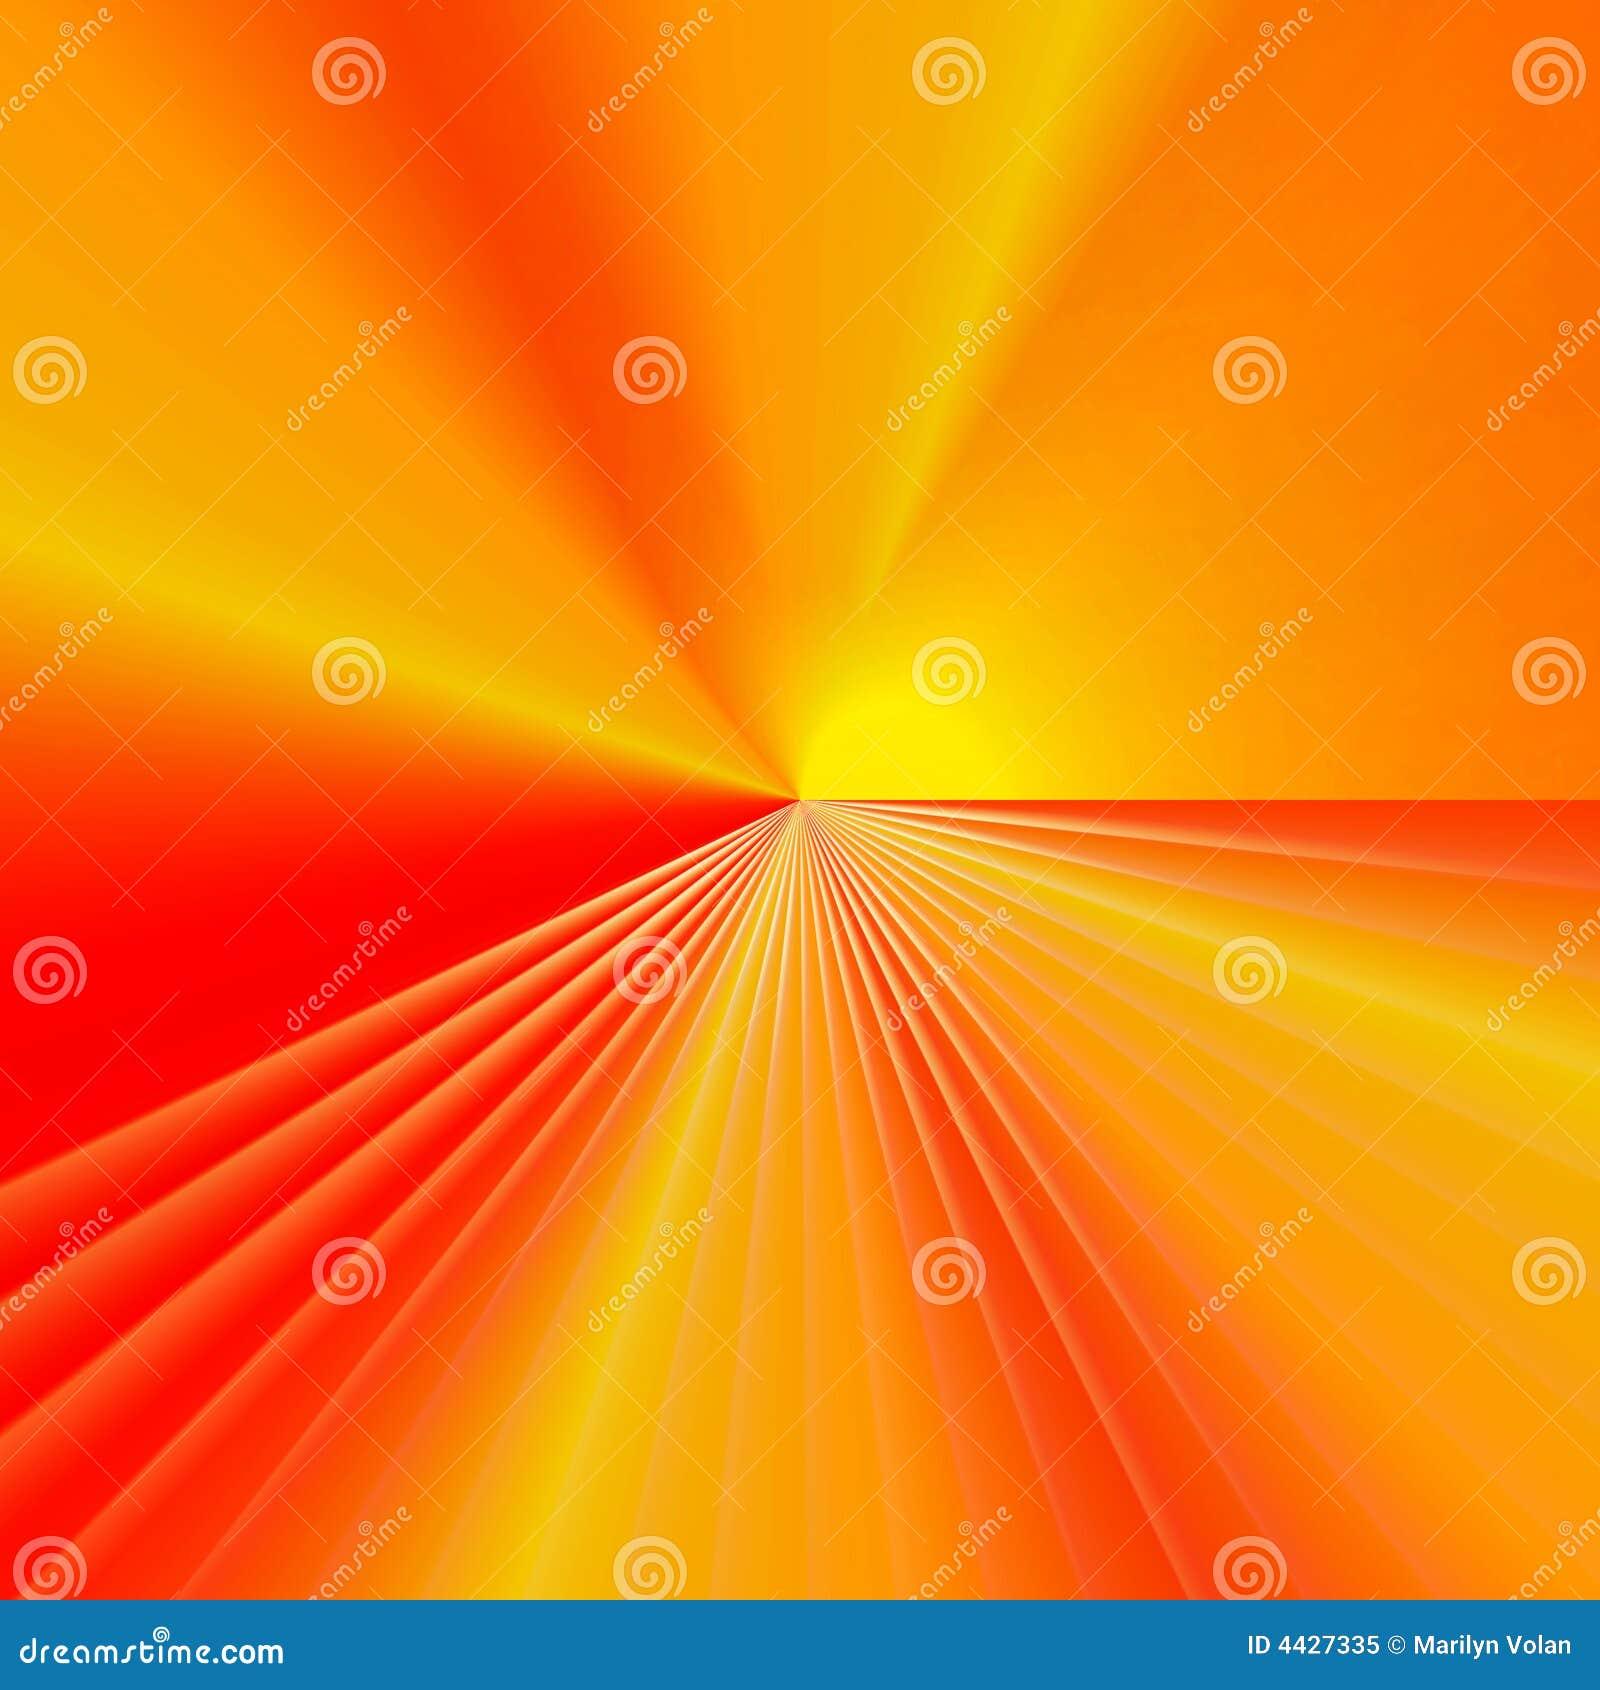 Red yellow orange background royalty free stock photo image